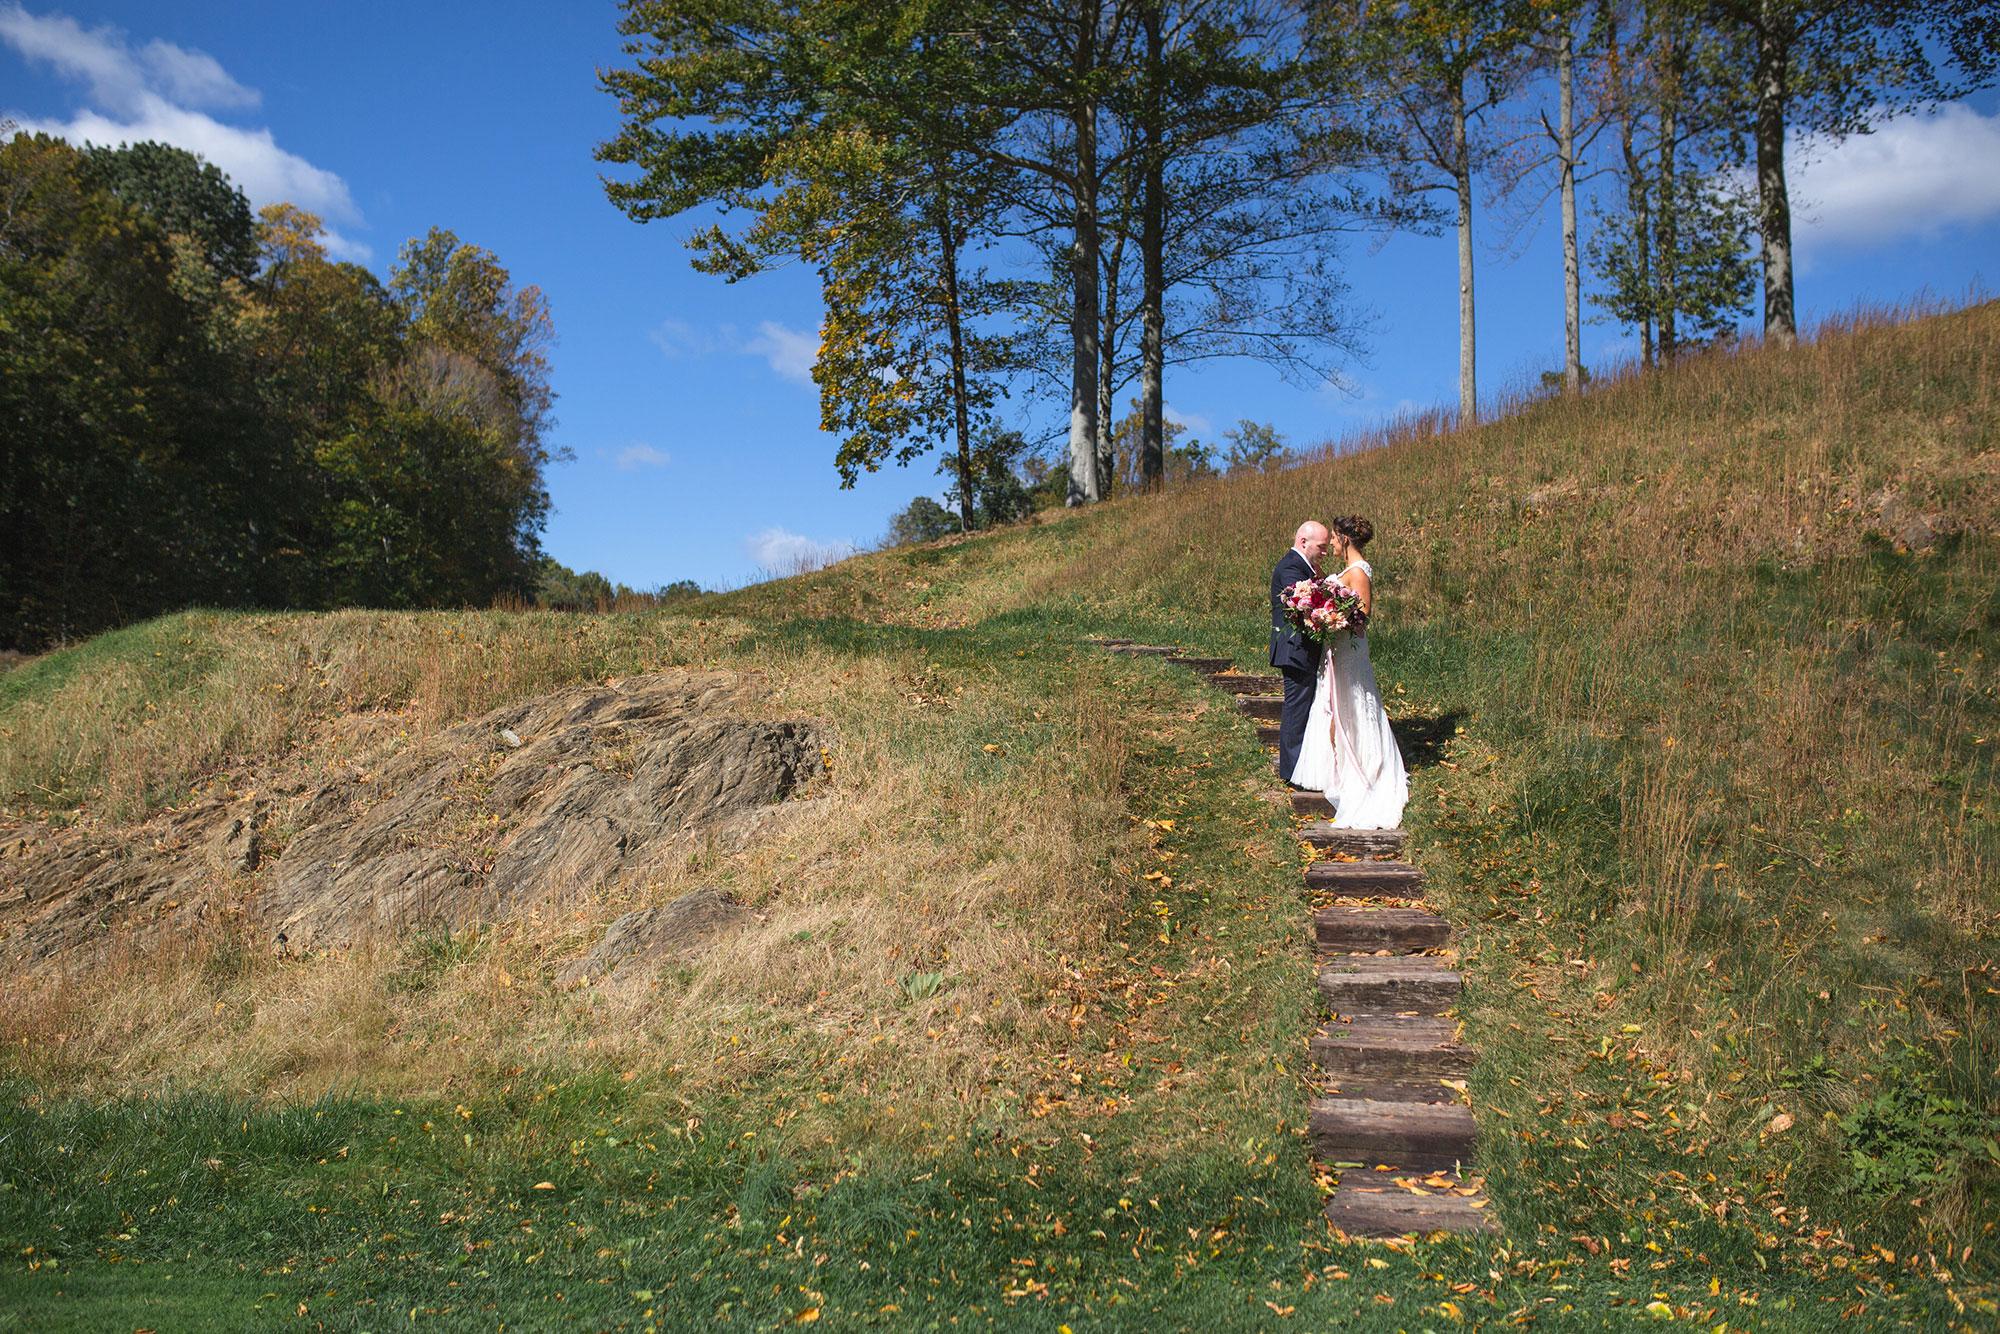 Tony-and-Maggie-Wedding-1287.jpg